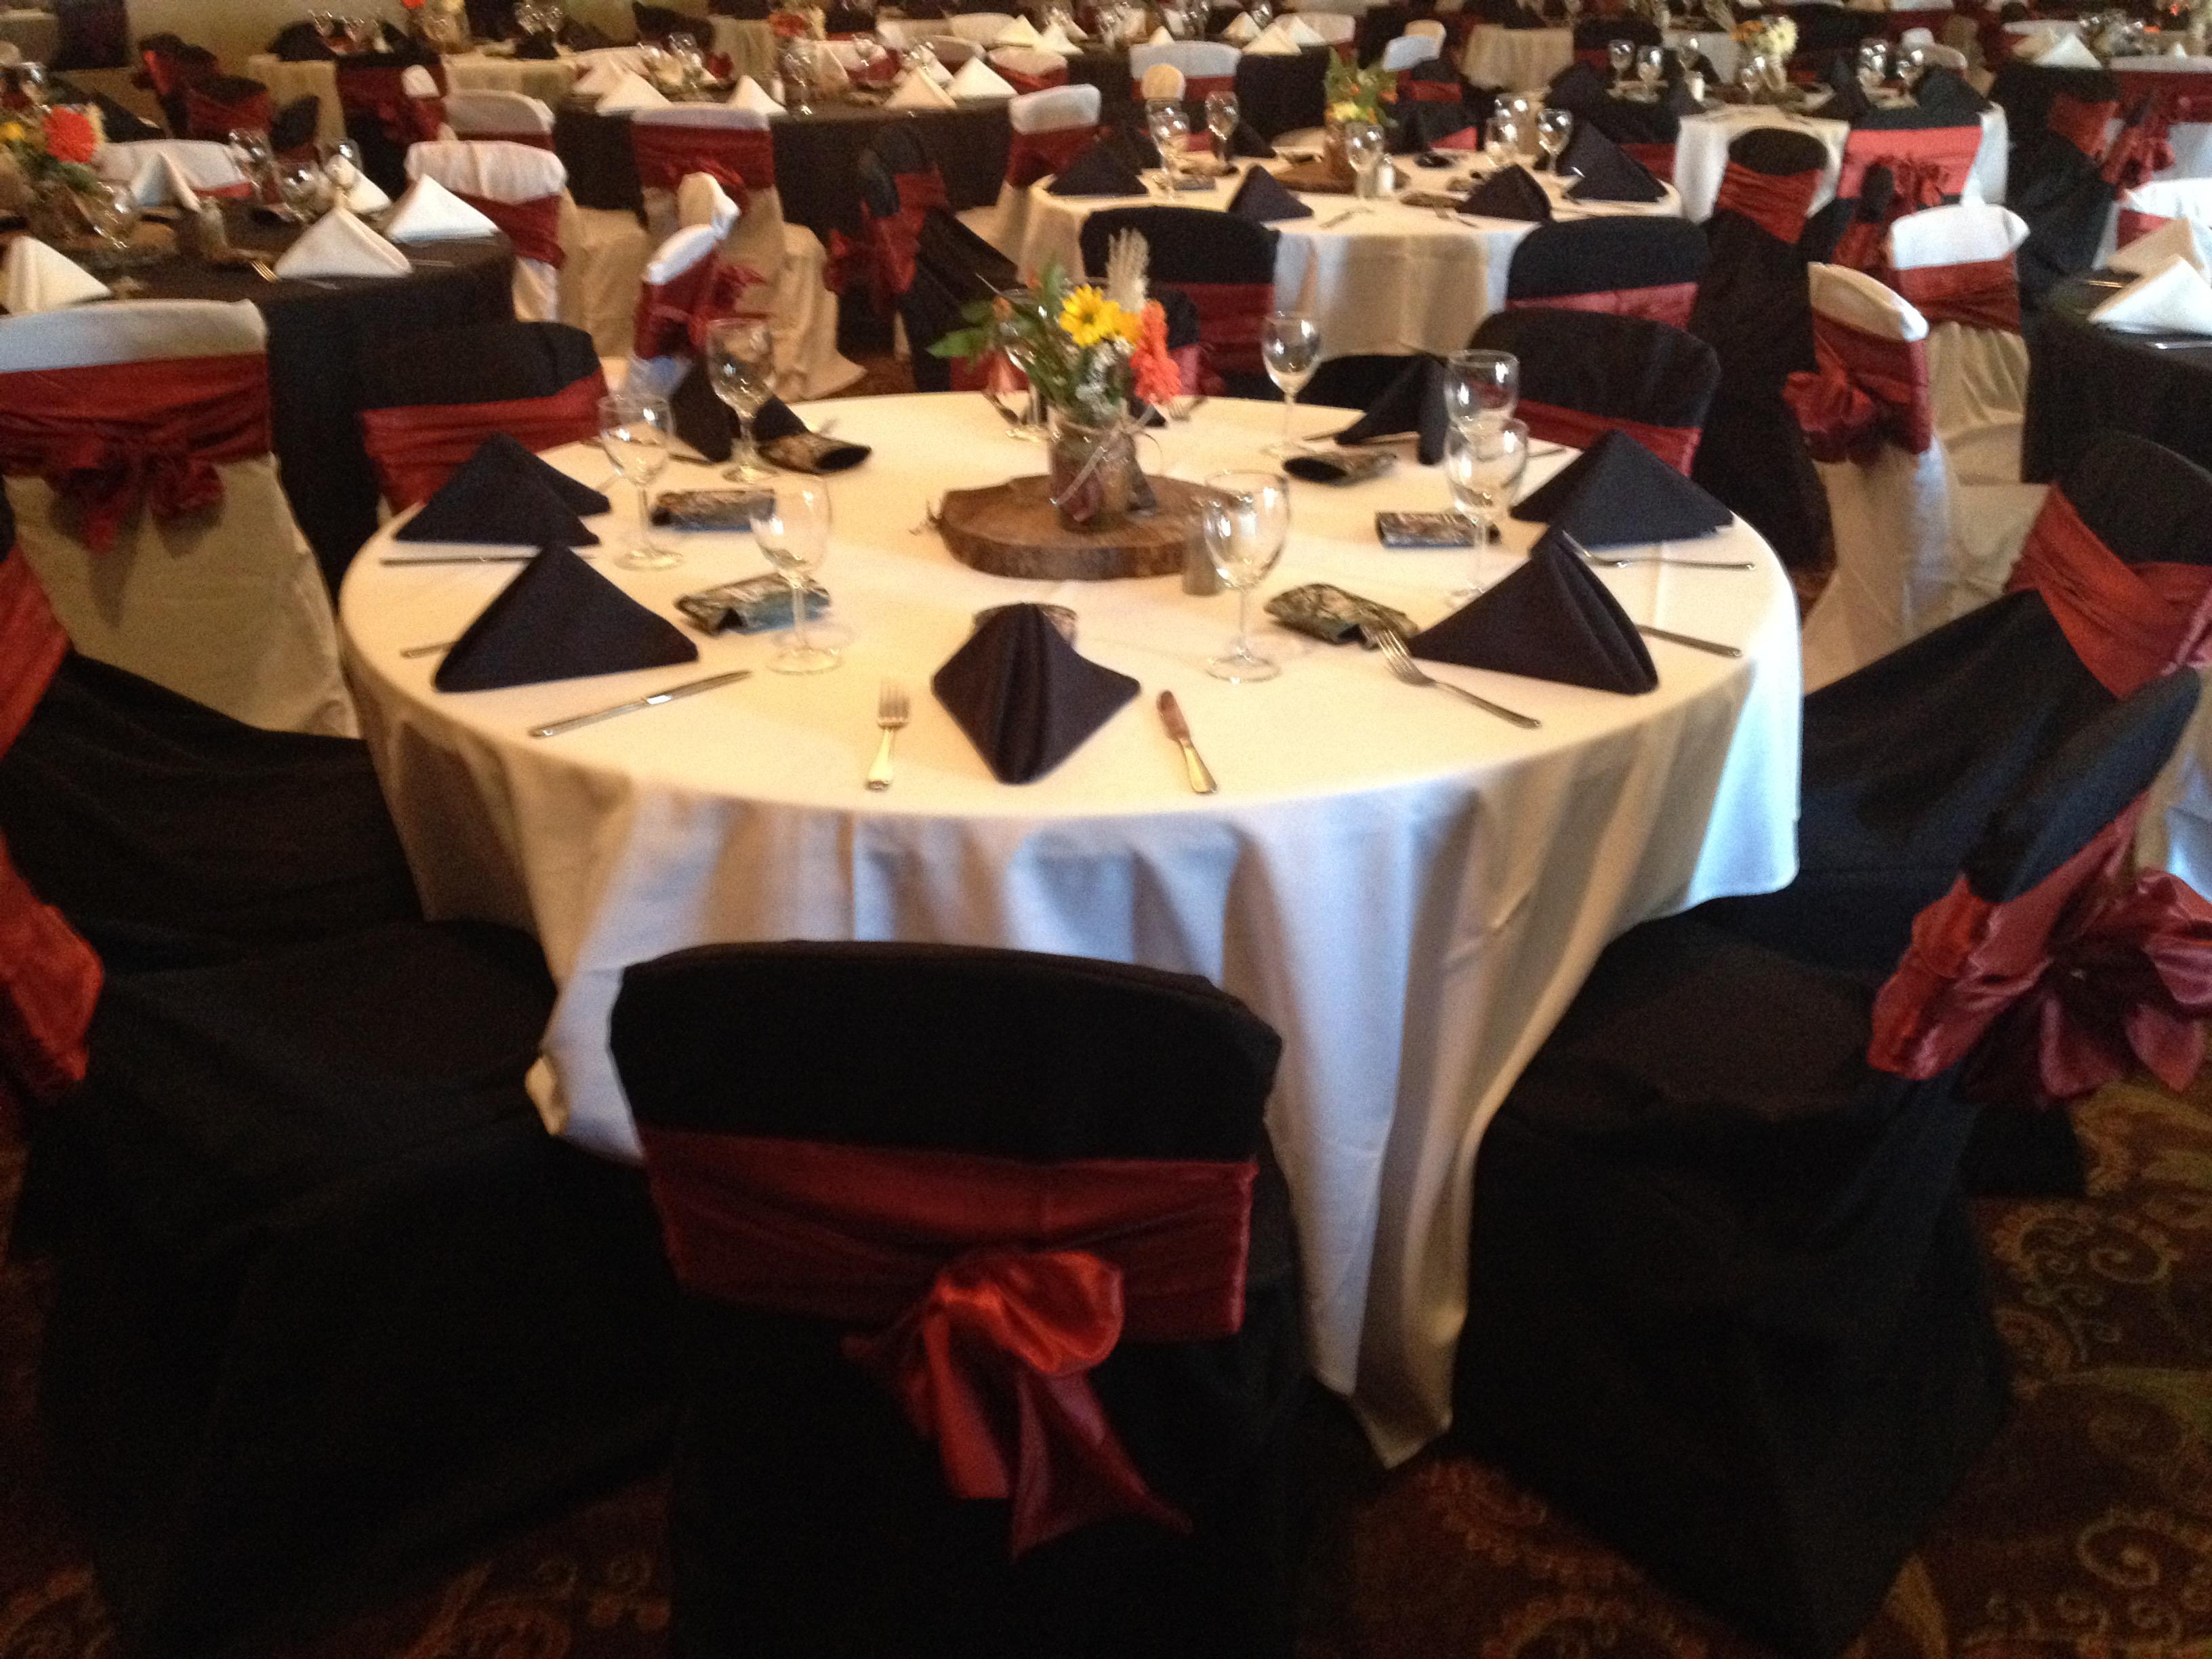 anna chair cover & wedding linens rental burnaby bc hanging bean bag rentals  boutique tbc